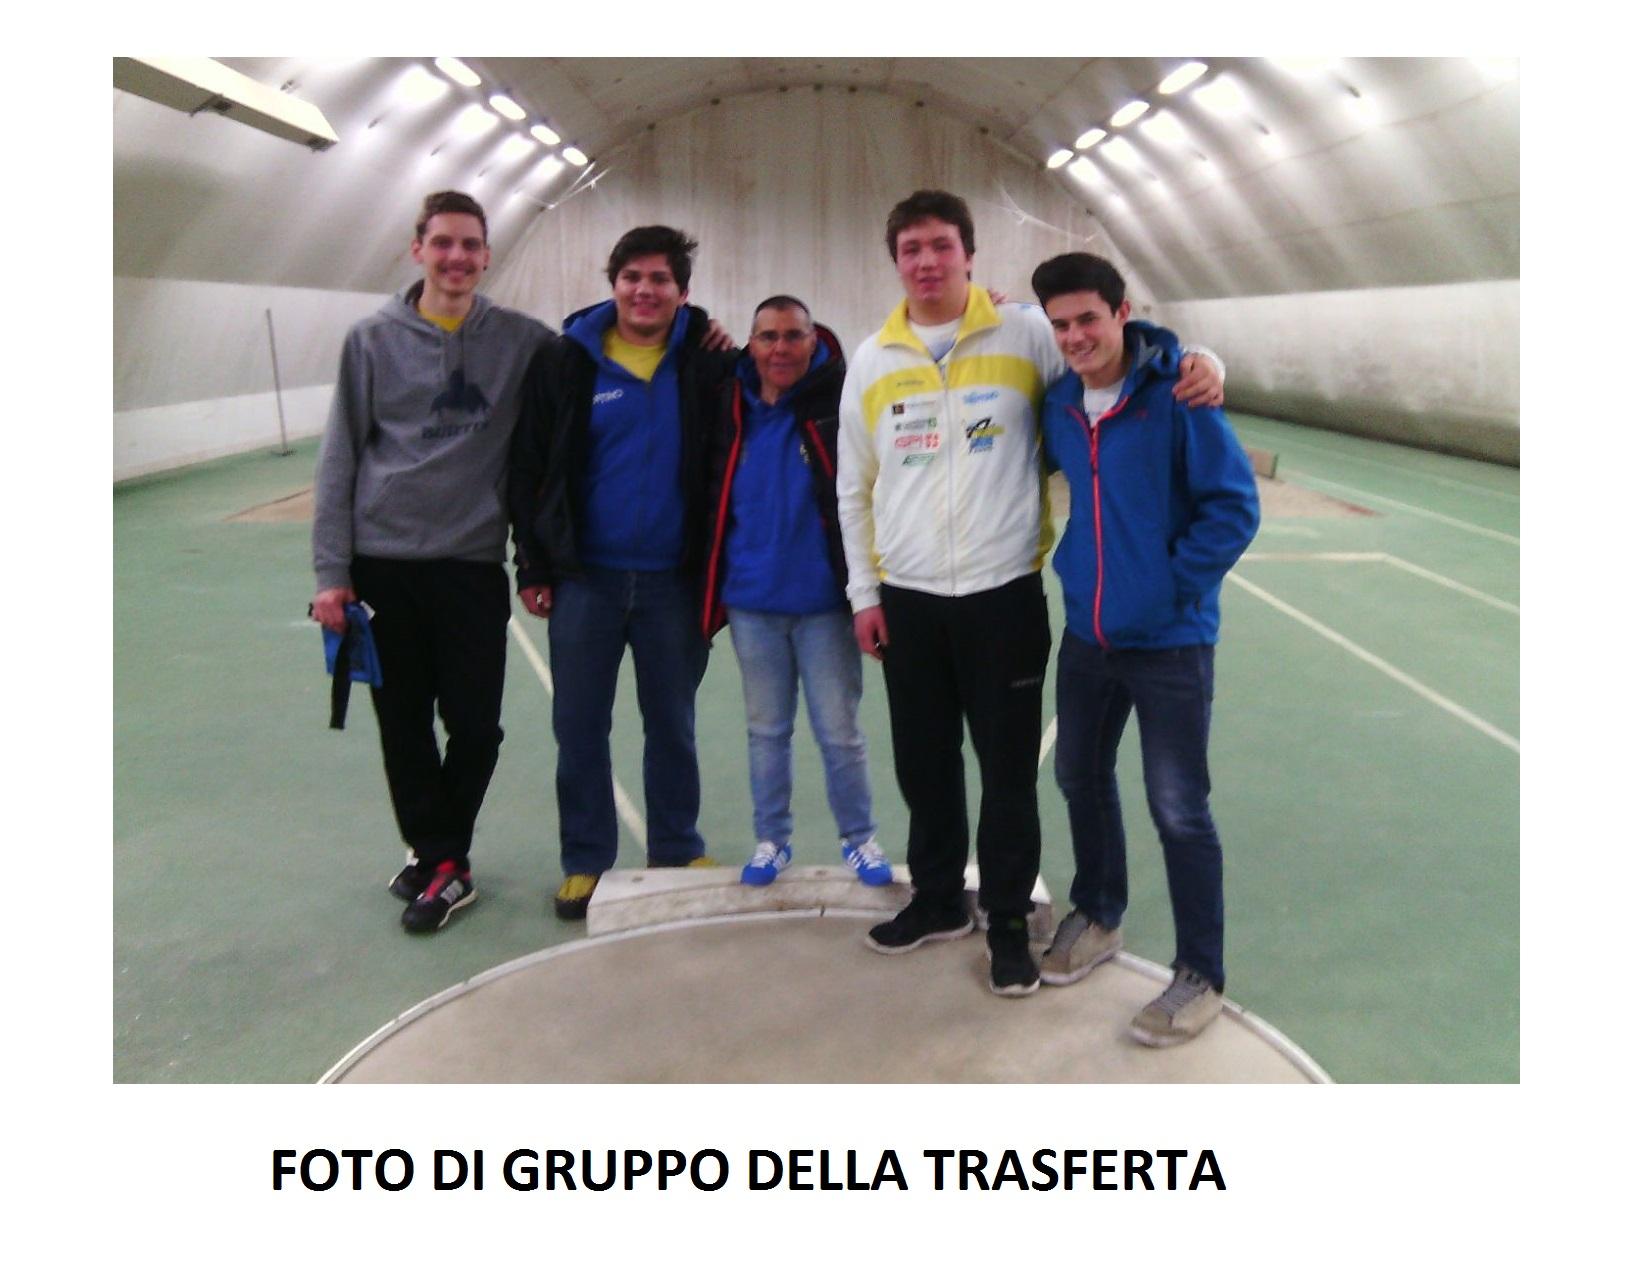 TROFEO CARLA SPORT: GIACOMO BONA VINCE FRA GLI U20